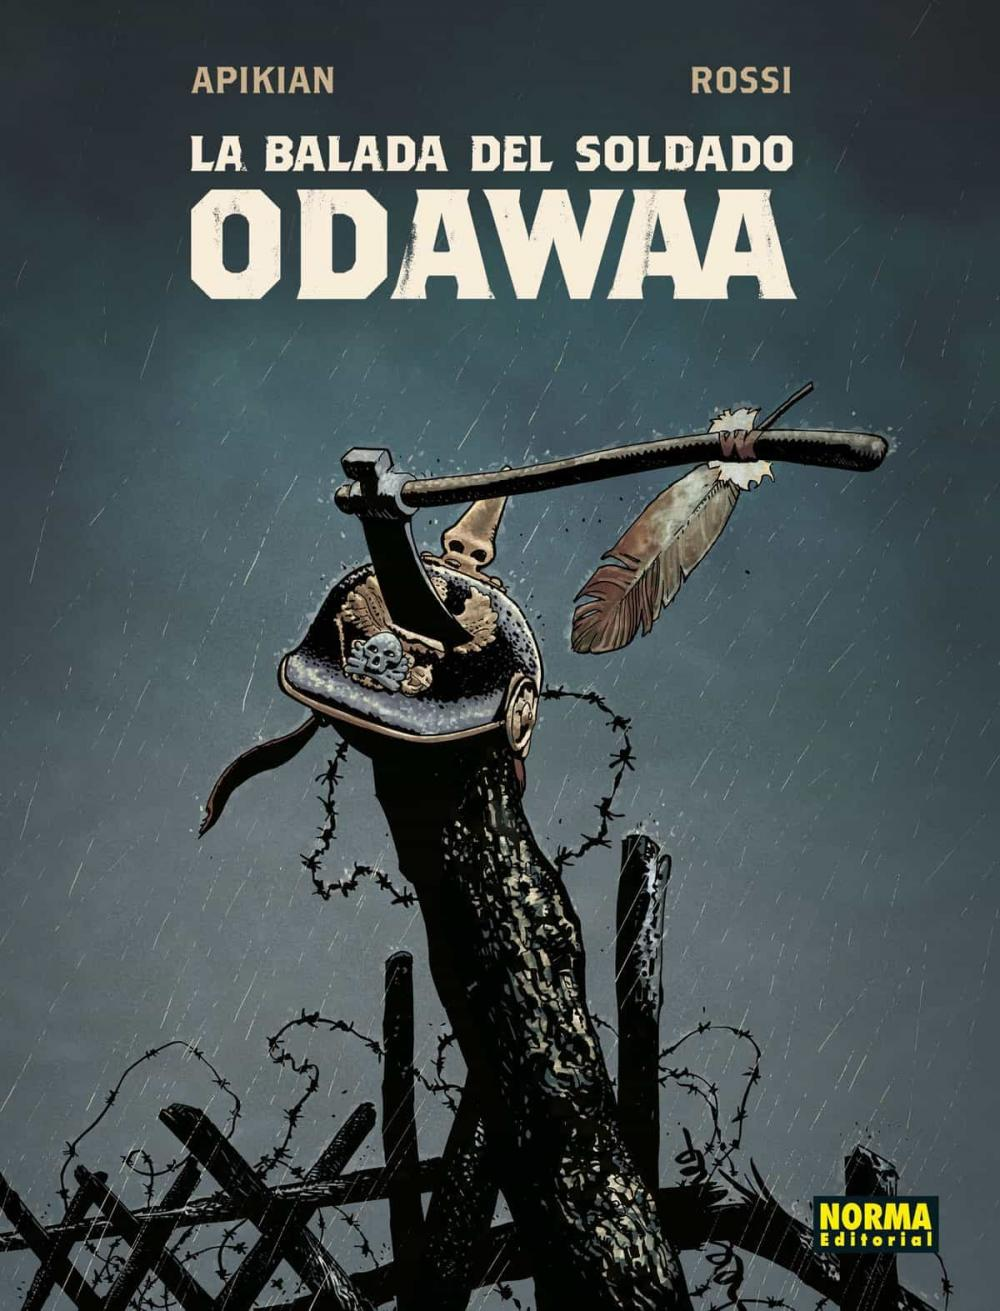 LA BALADA DEL SOLDADO ODAWAA